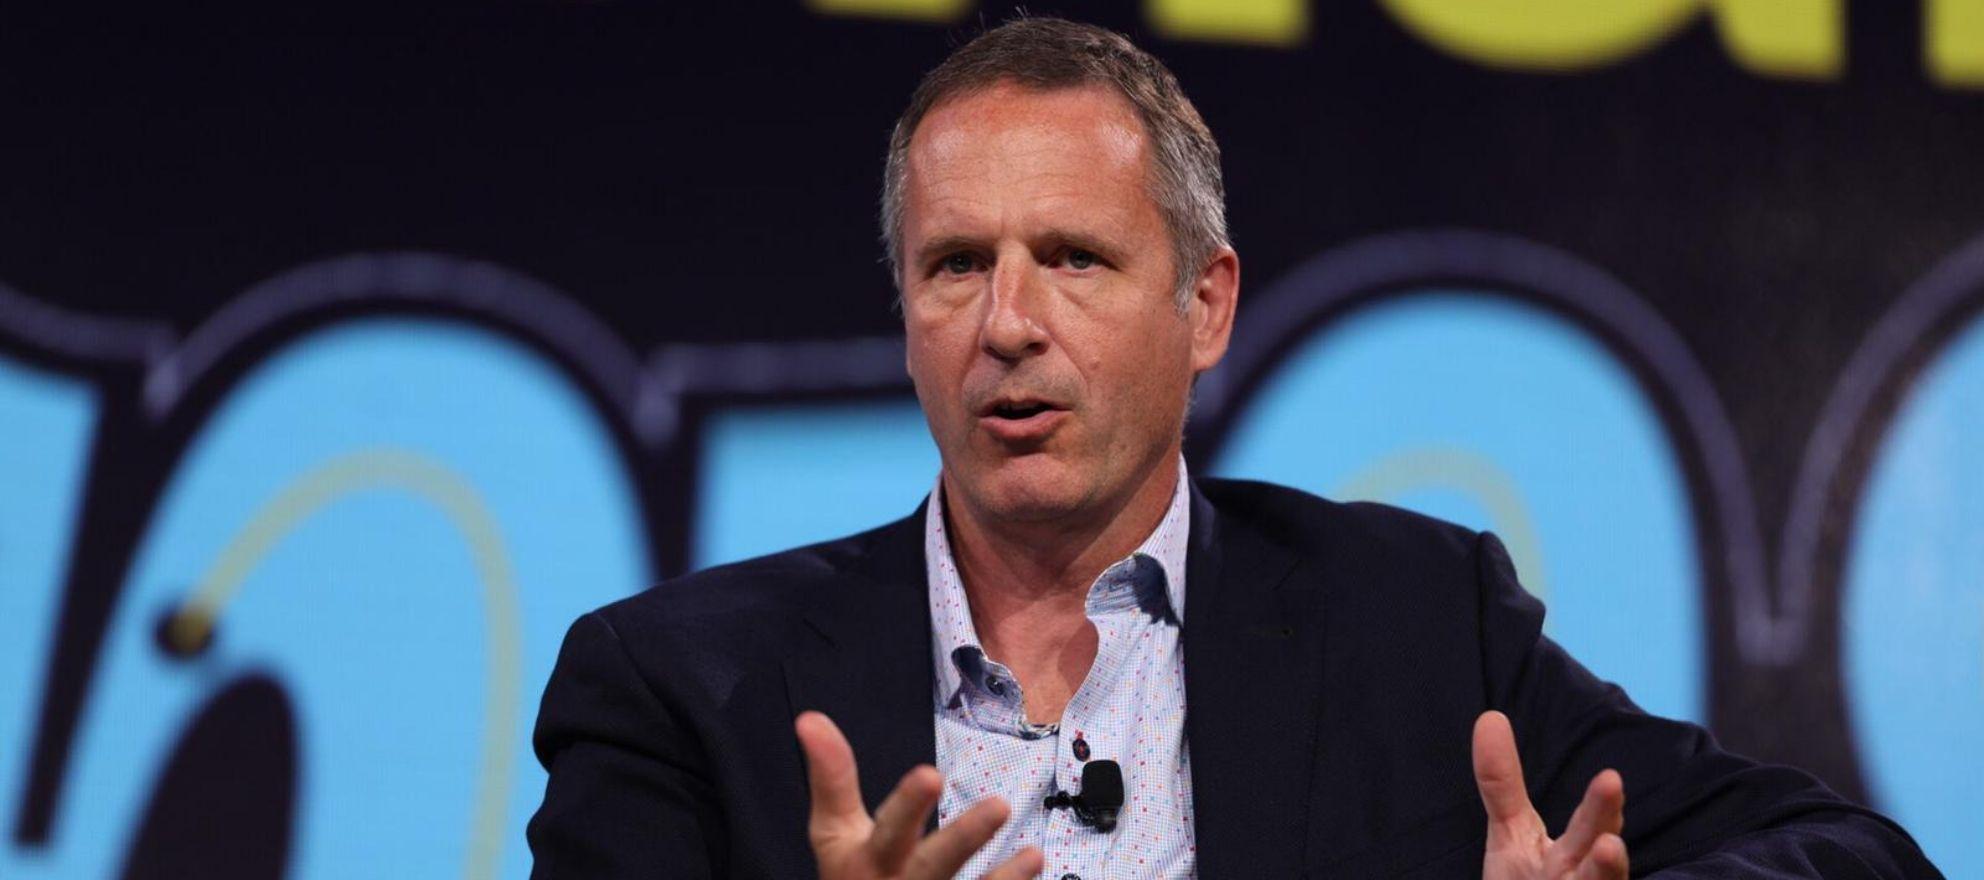 EXp Realty CEO Glenn Sanford is the billionaire next-door